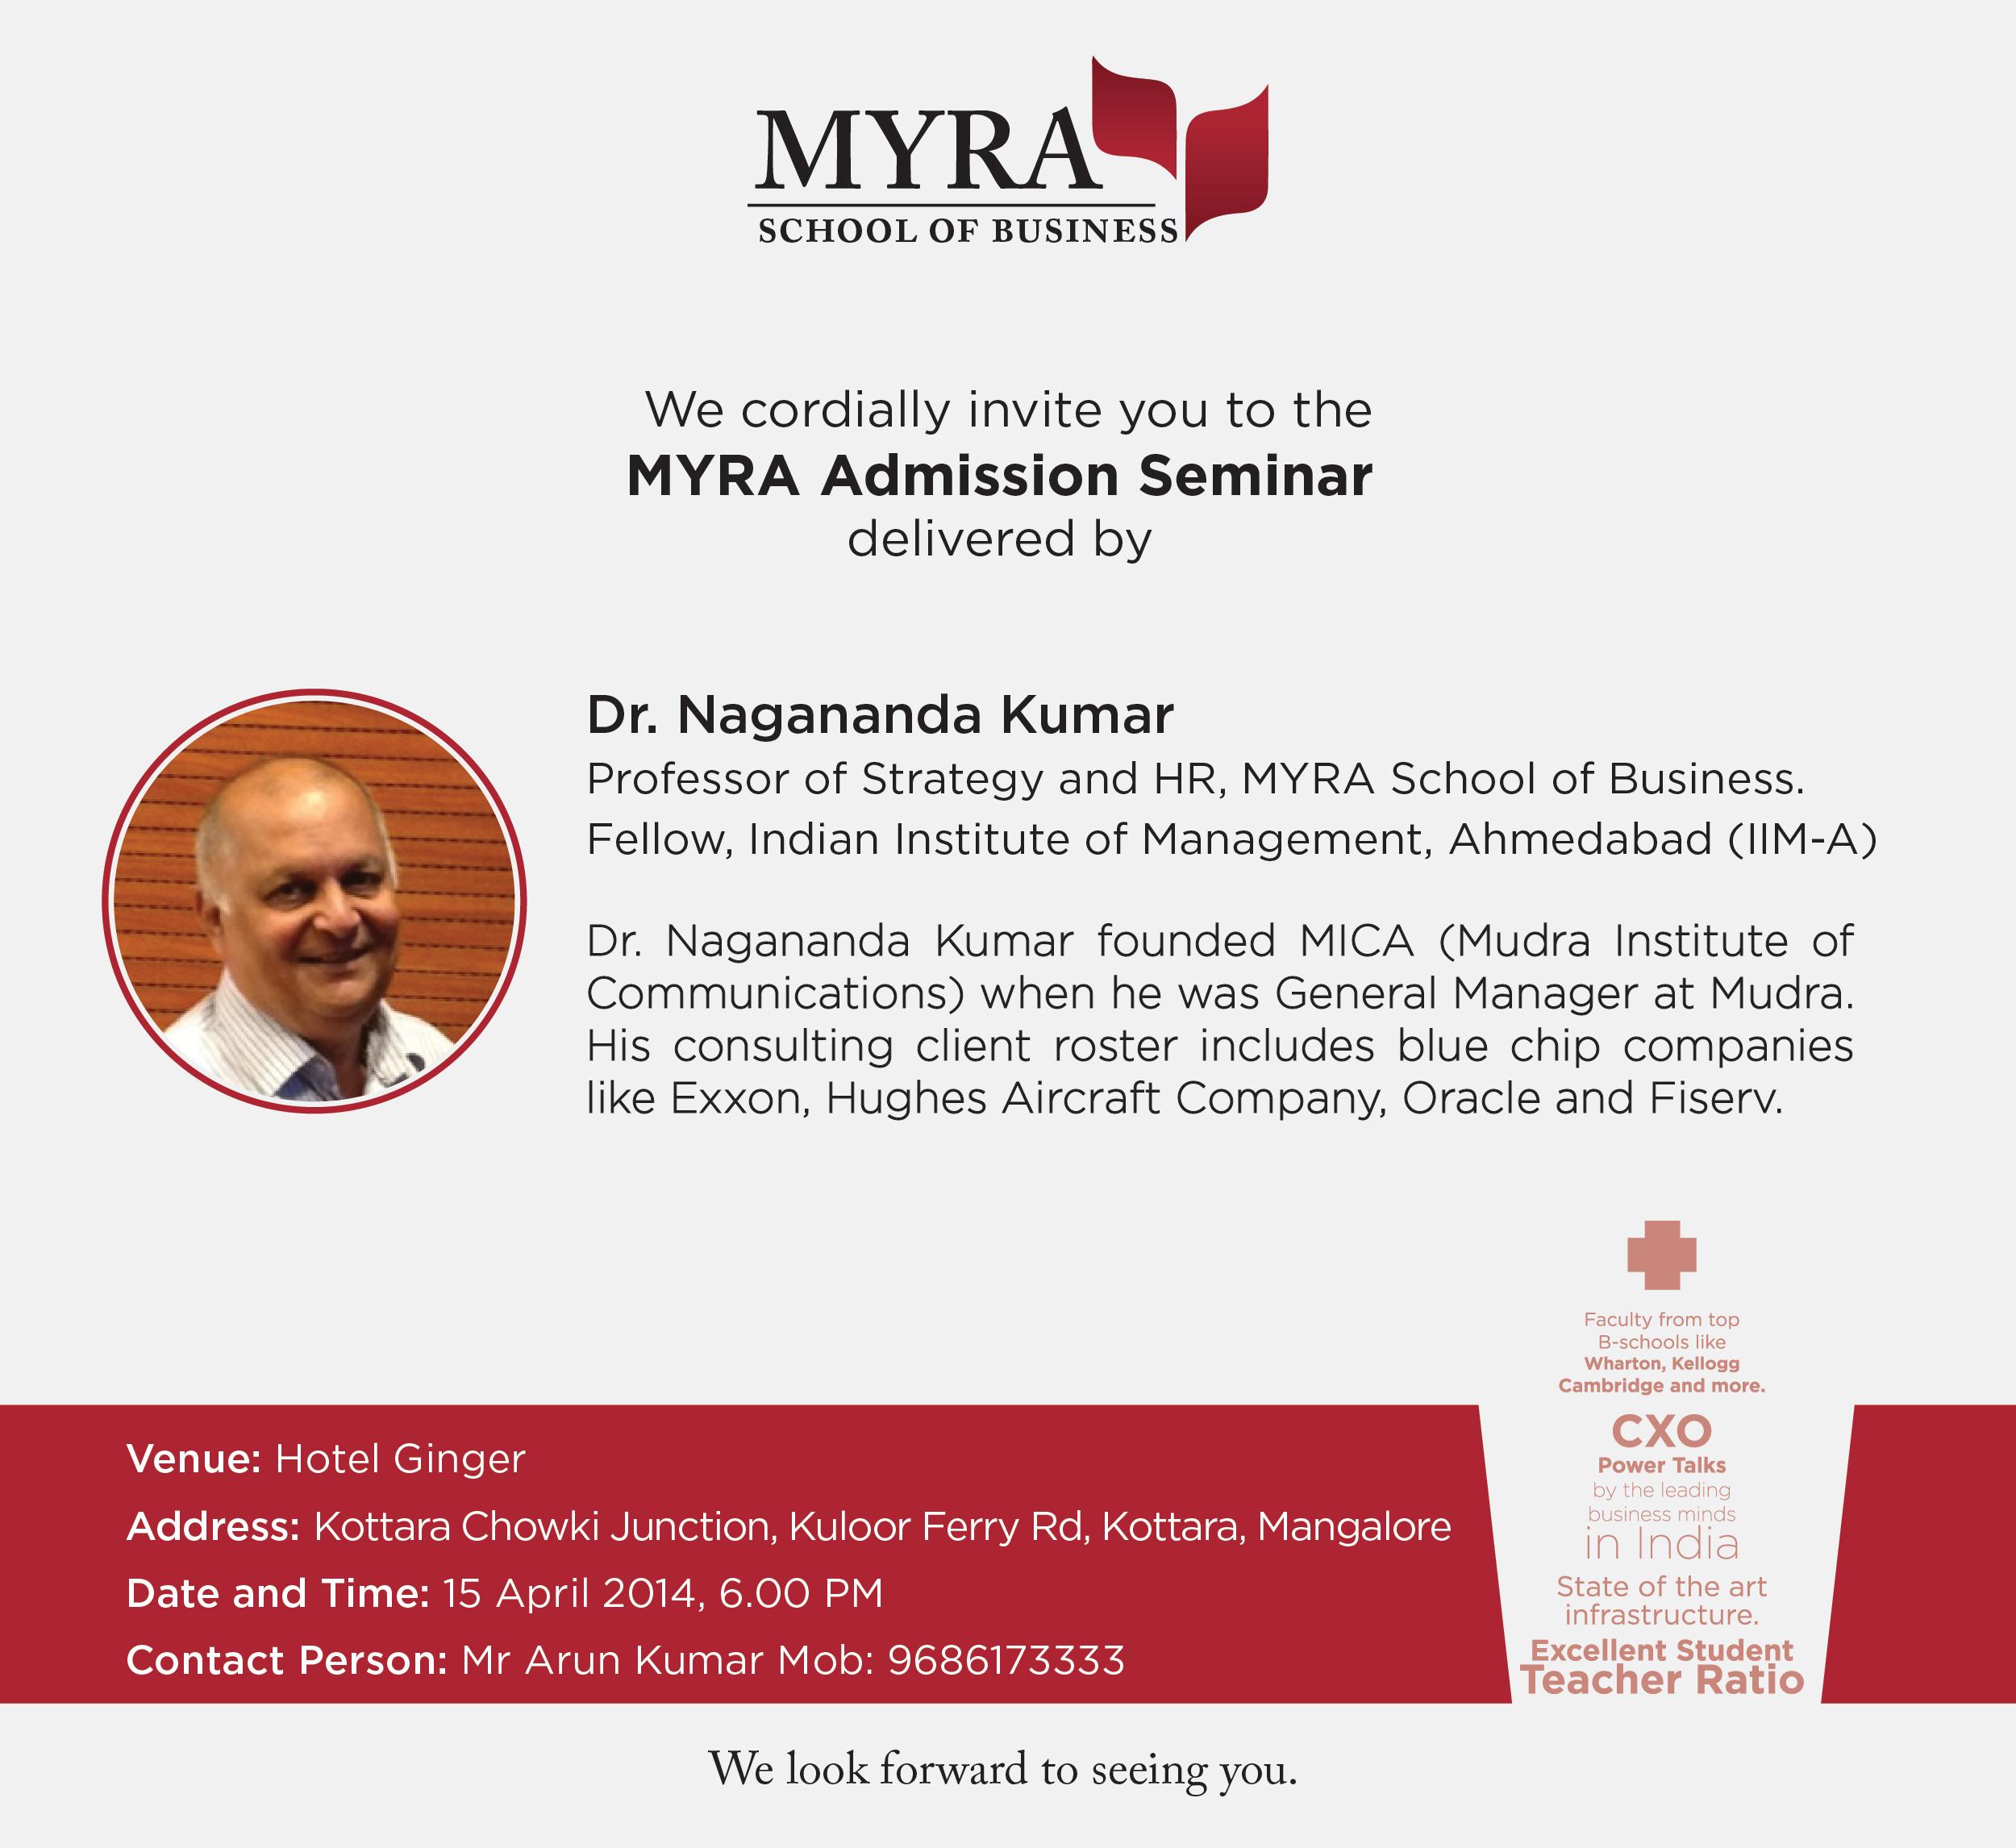 MYRA-AdmissionSeminar-Mangalore_invite